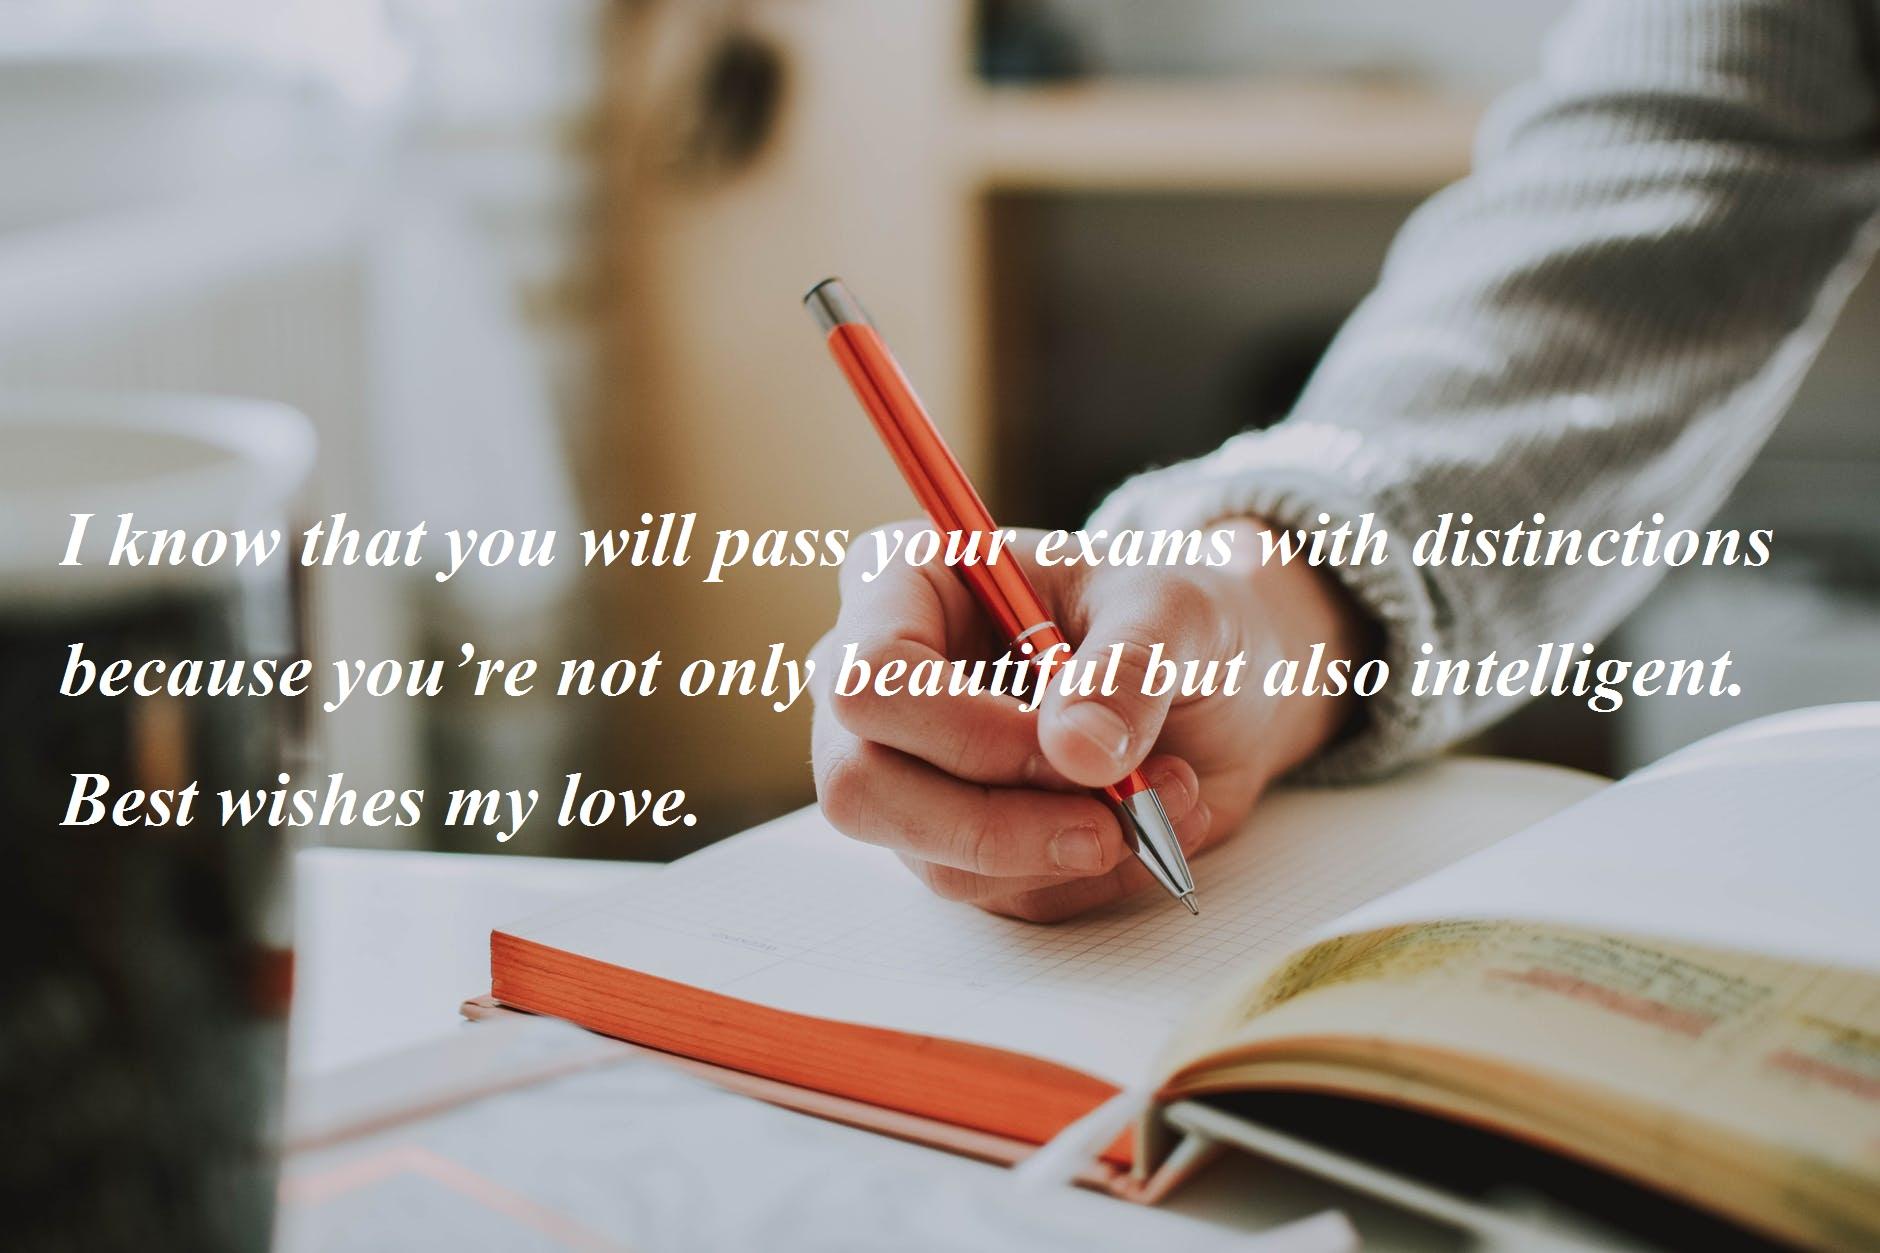 Exam Wishes Quotes